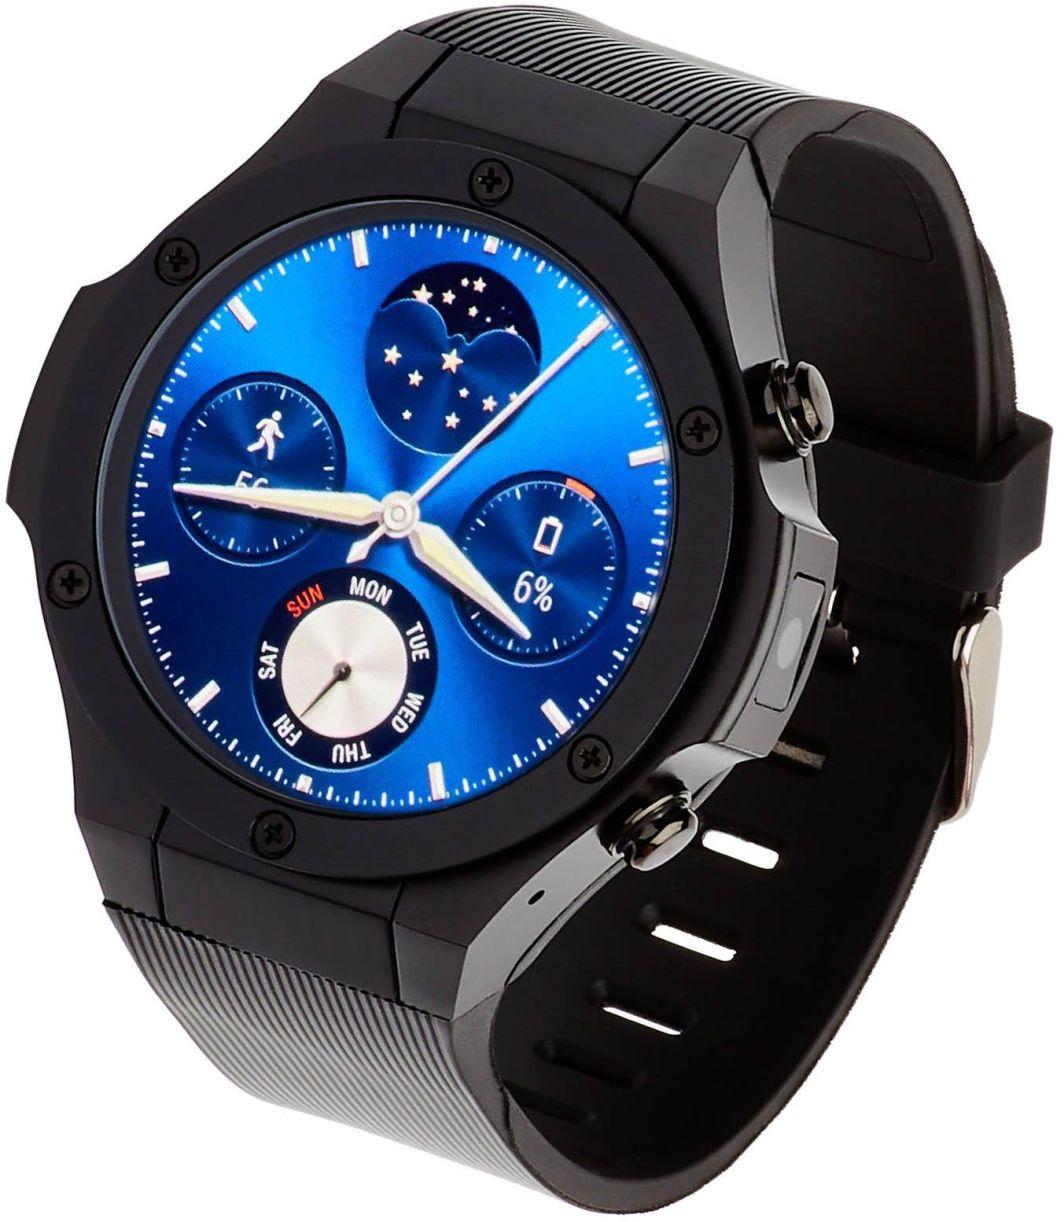 Smartwatch Garett Electronics Expert 15 Czarny  (Expert 15 czarny) 1